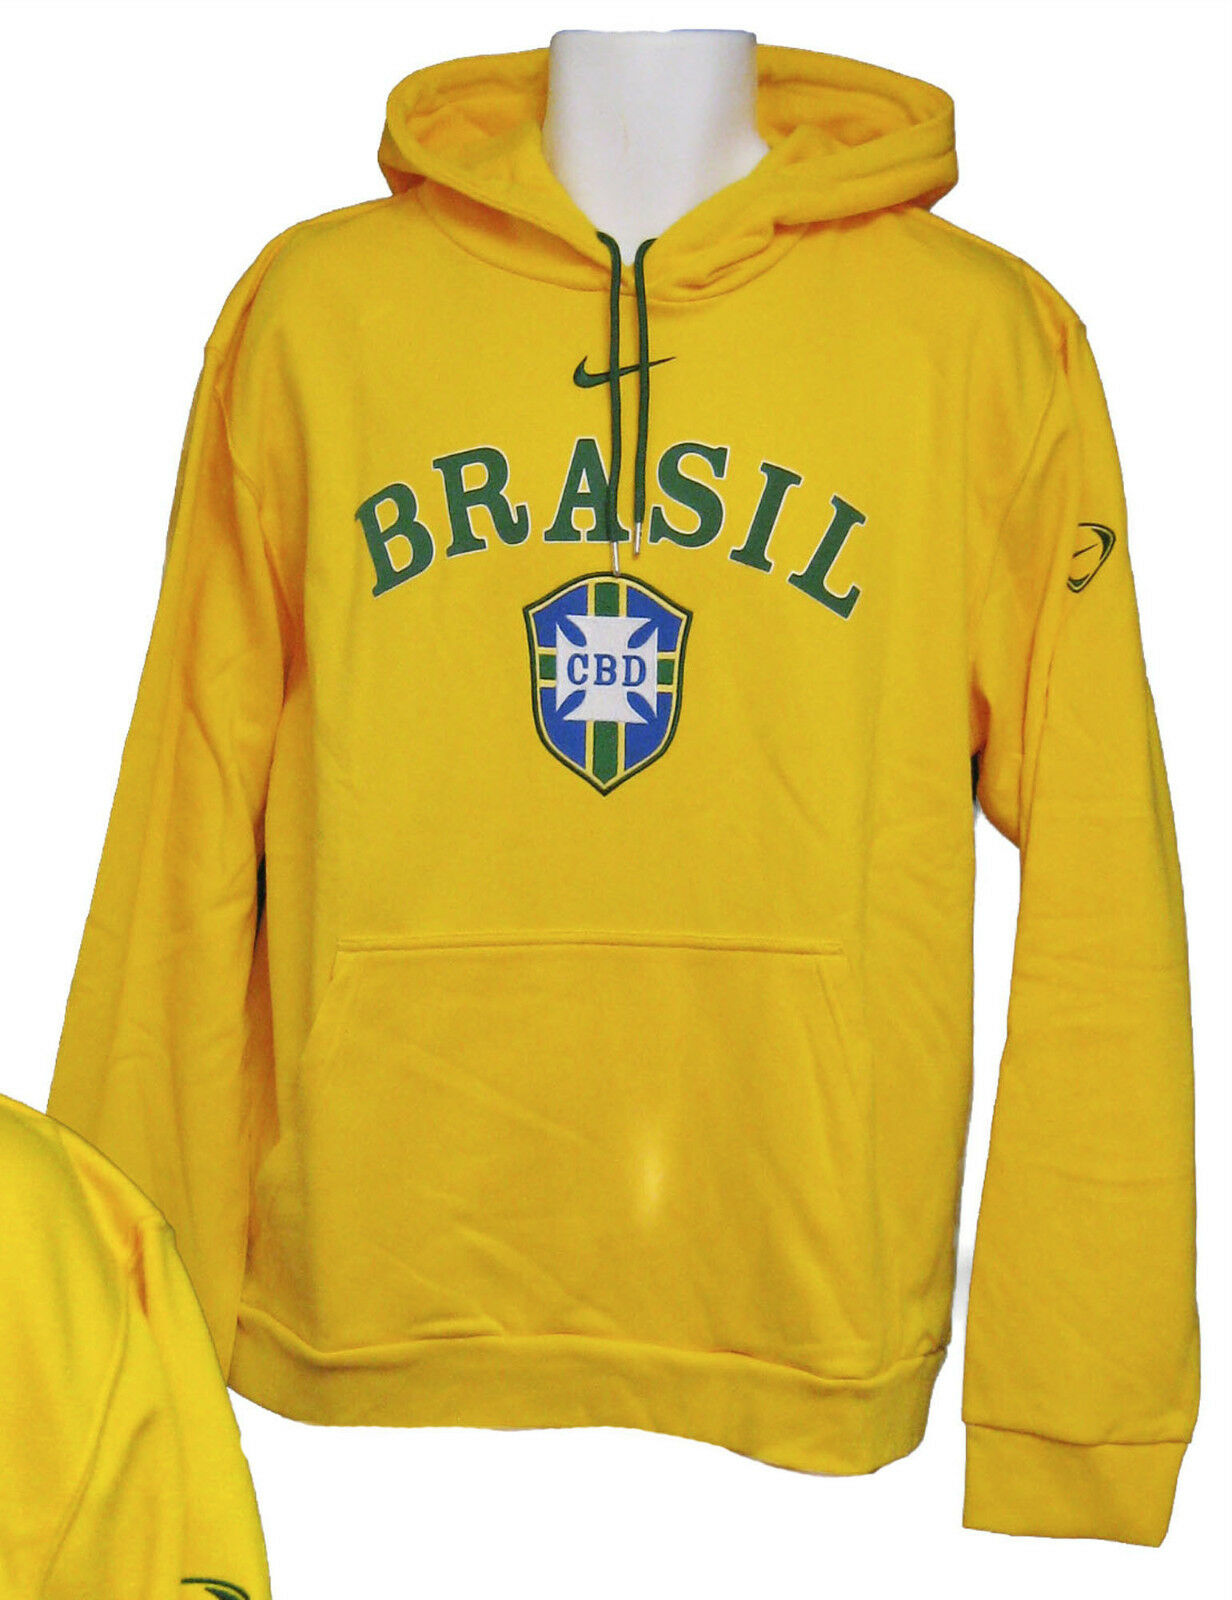 New NIKE Vintage  CBD BRAZIL BRASIL Football Cotton Hoodie Canary Yellow Large